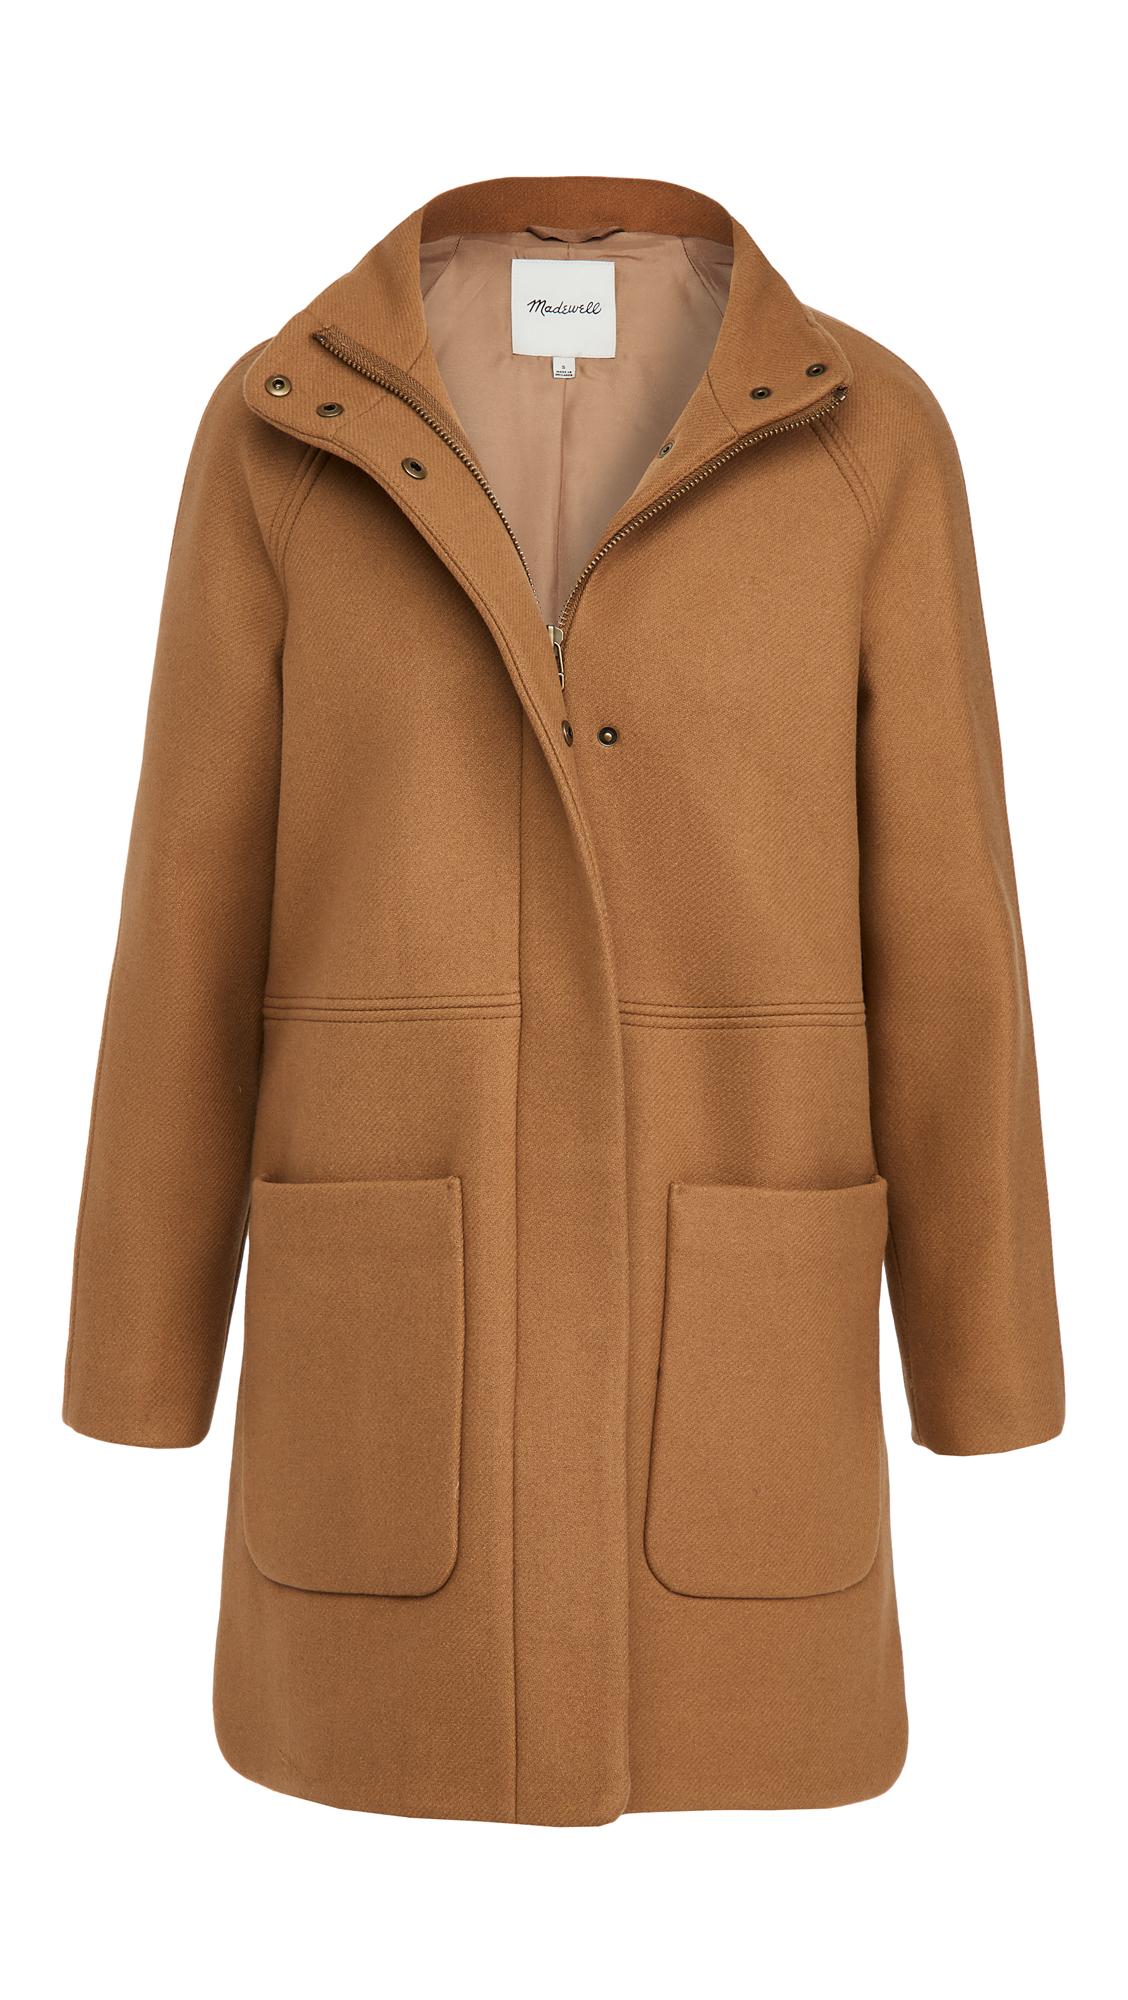 Madewell Estate Cocoon Coat